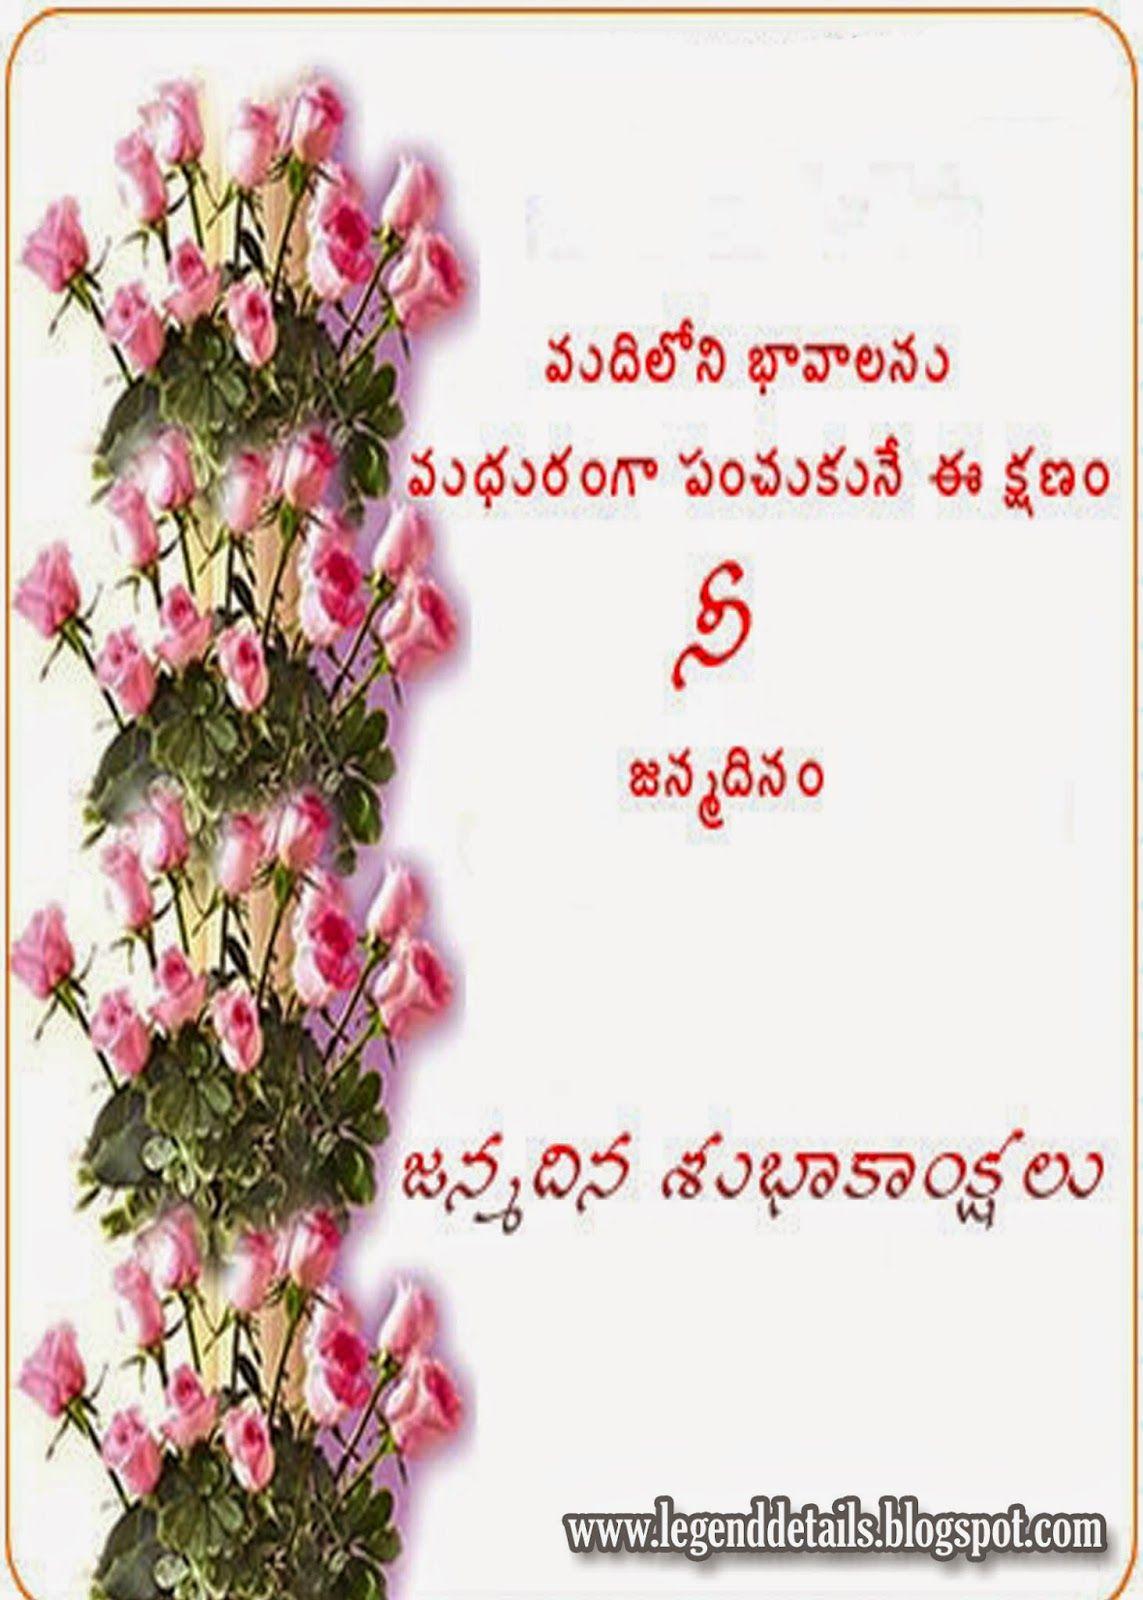 Birth day greetings in telugu free subhakankshalu with images birth day greetings in telugu free subhakankshalu with images birth day sms kristyandbryce Choice Image